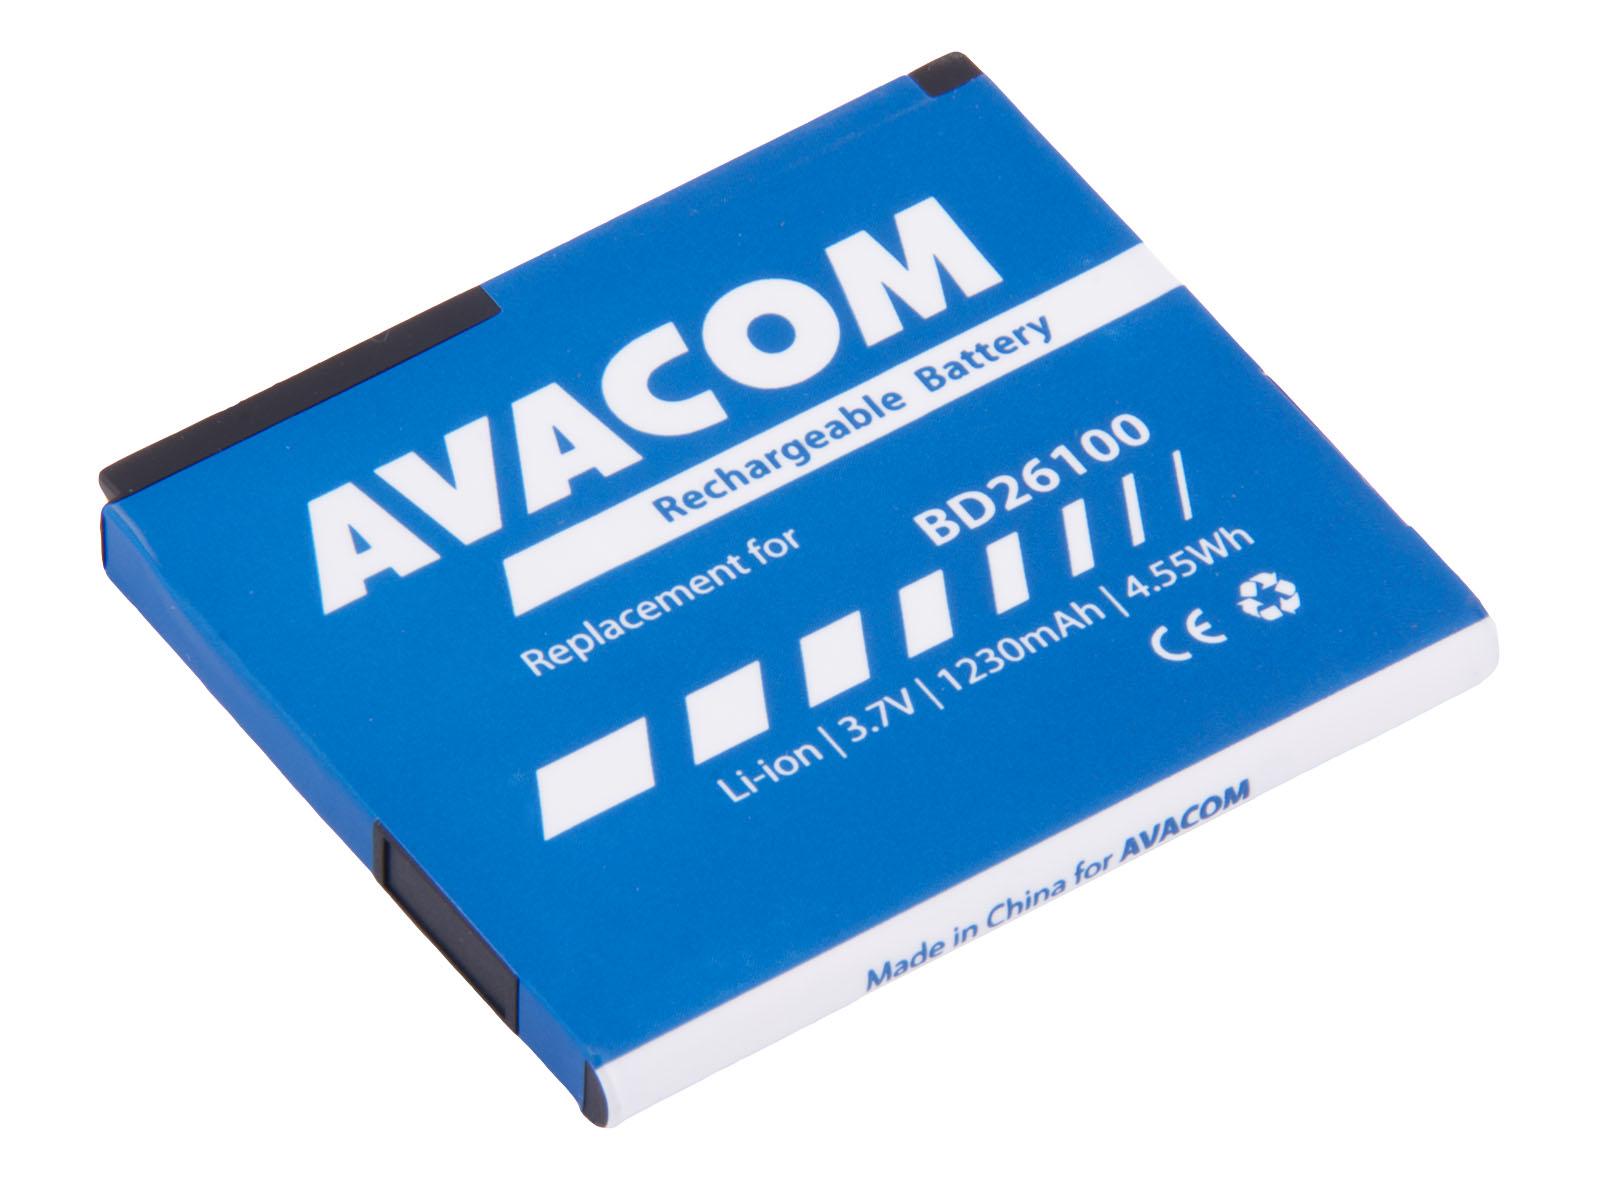 Baterie AVACOM PDHT-ACE-S1230 do mobilu HTC Desire HD, HTC Ace Li-Ion 3,6V 1230mAh